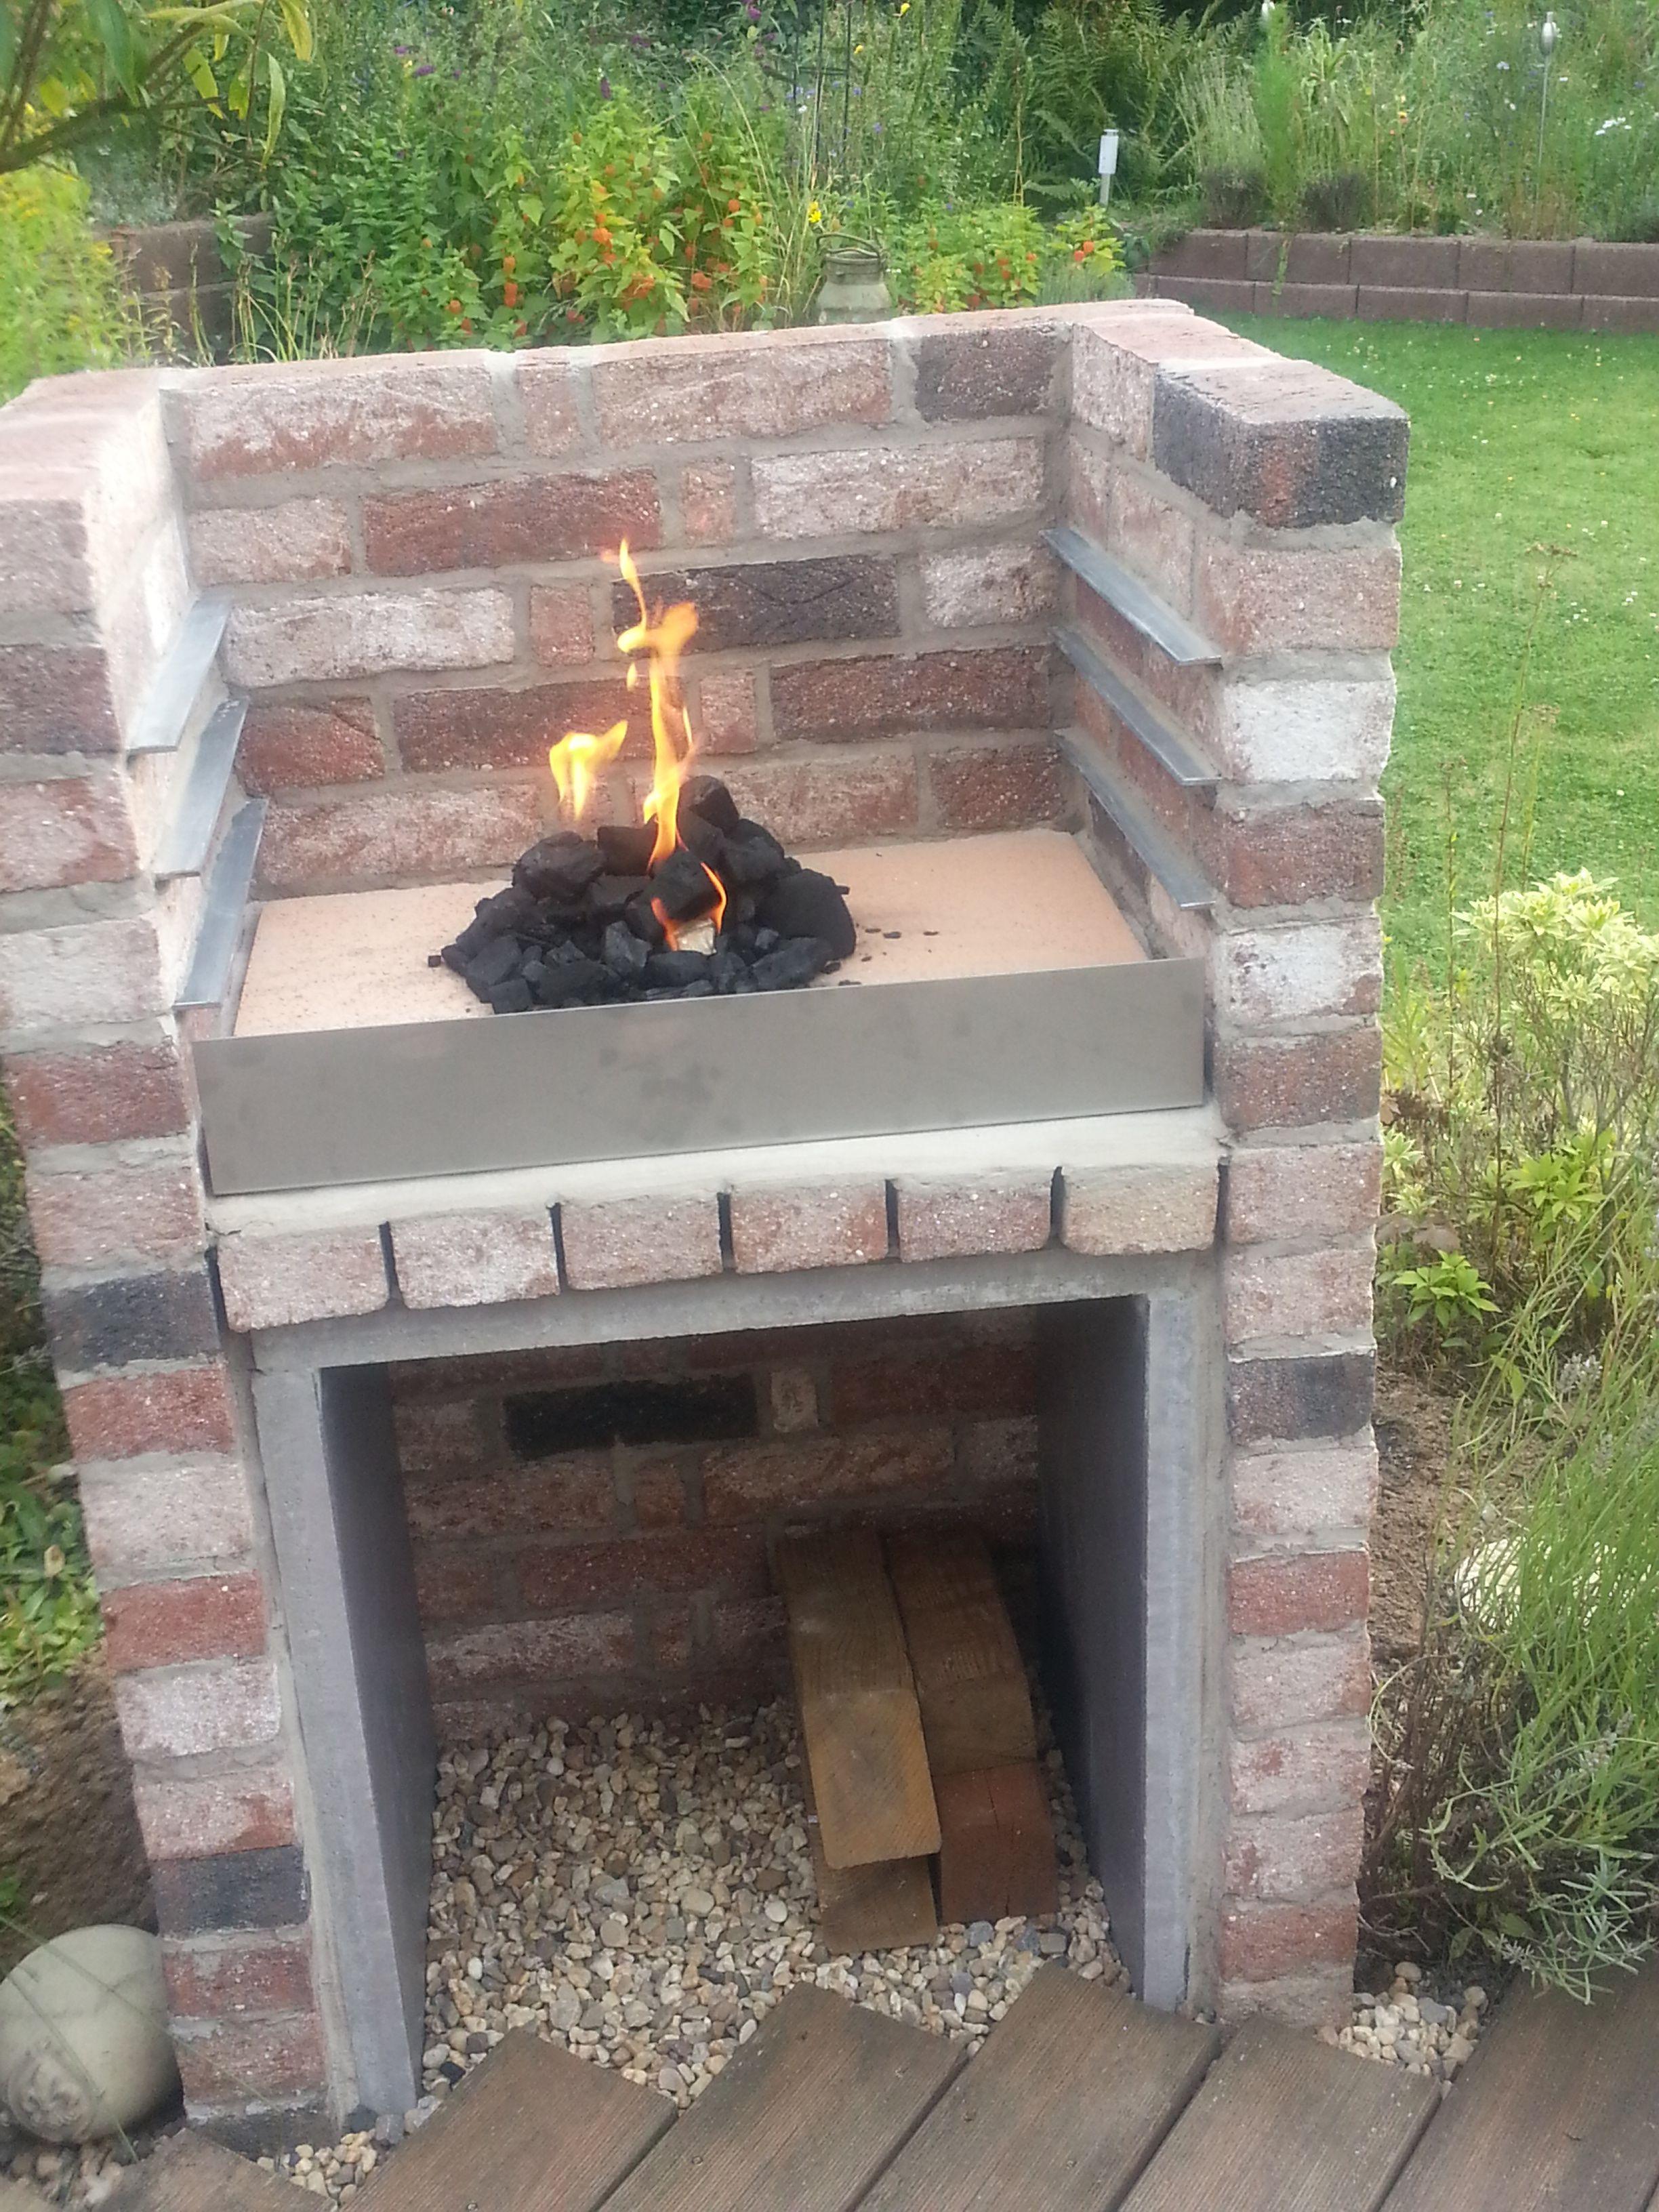 grill selbst gemauert gartenideen pinterest grill gartengrill und g rten. Black Bedroom Furniture Sets. Home Design Ideas